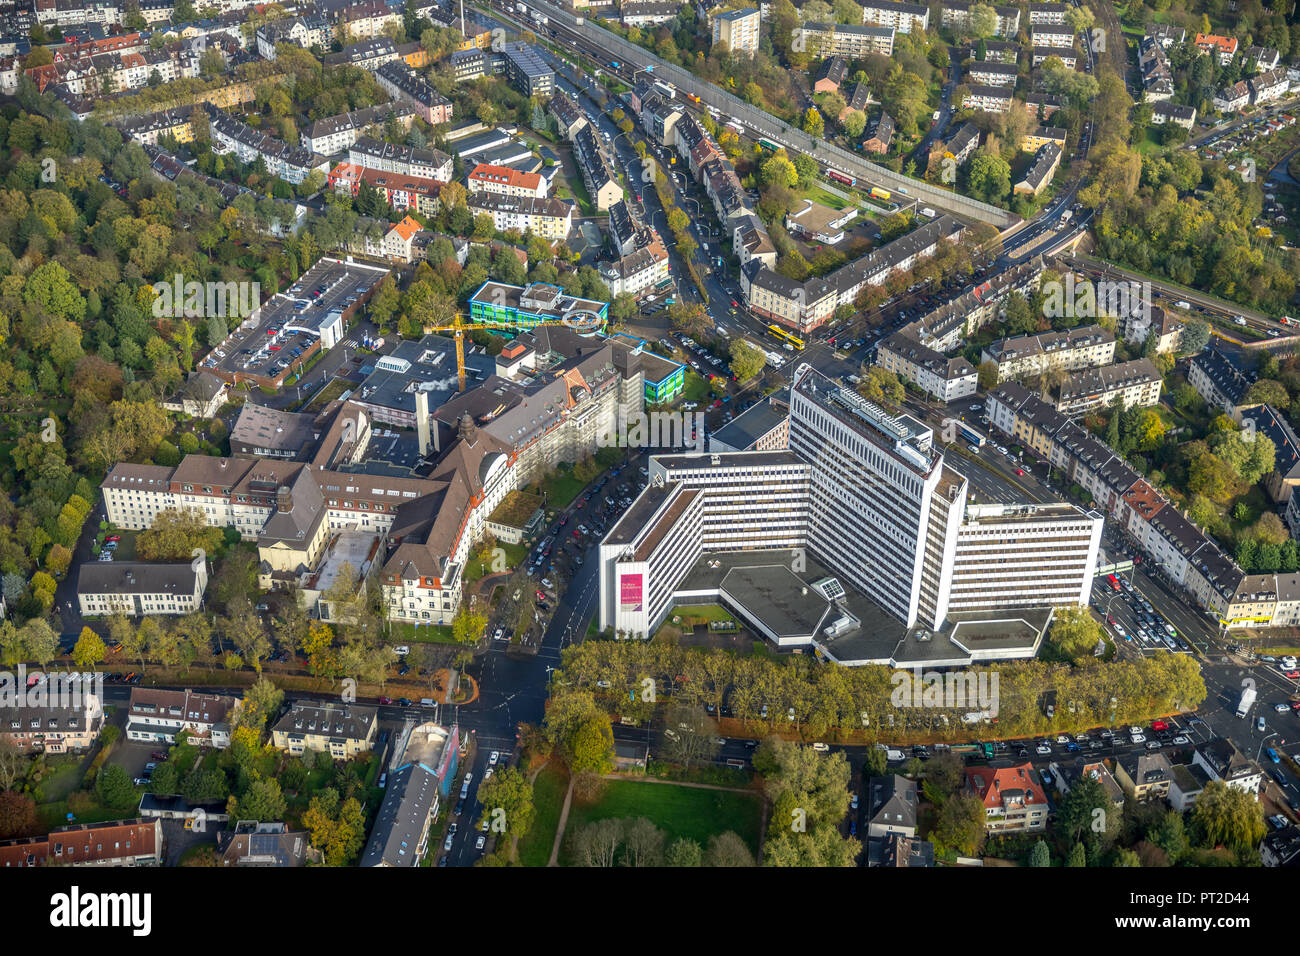 Elisabeth Hospital, Academic Teaching Hospital of the University of Duisburg-Essen, Huttrop, Social Pediatric Center, Essen, Ruhr Area, North Rhine-Westphalia, Germany - Stock Image